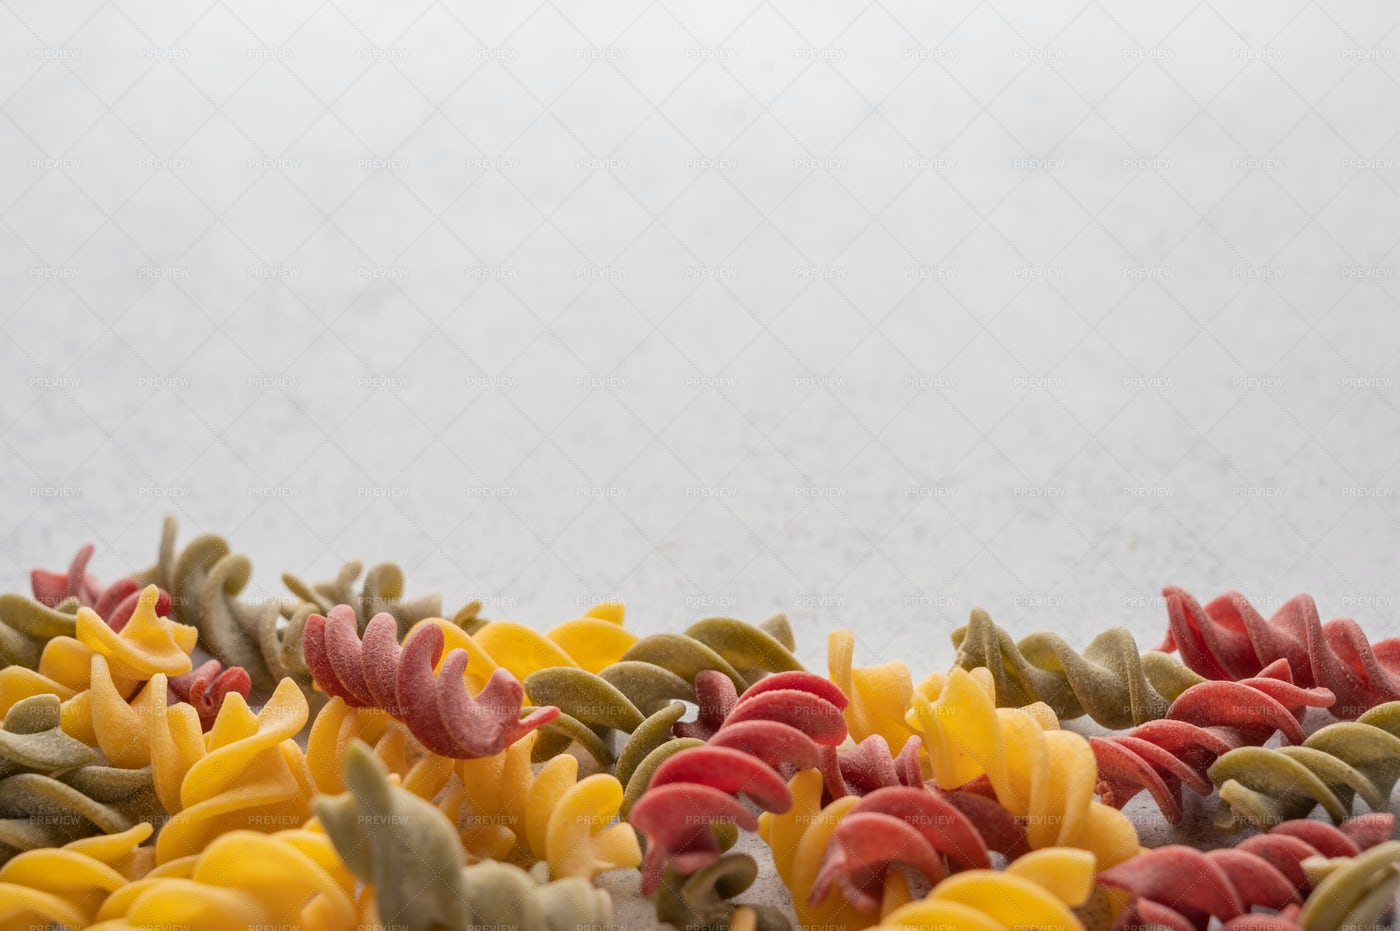 Colorful Pasta: Stock Photos